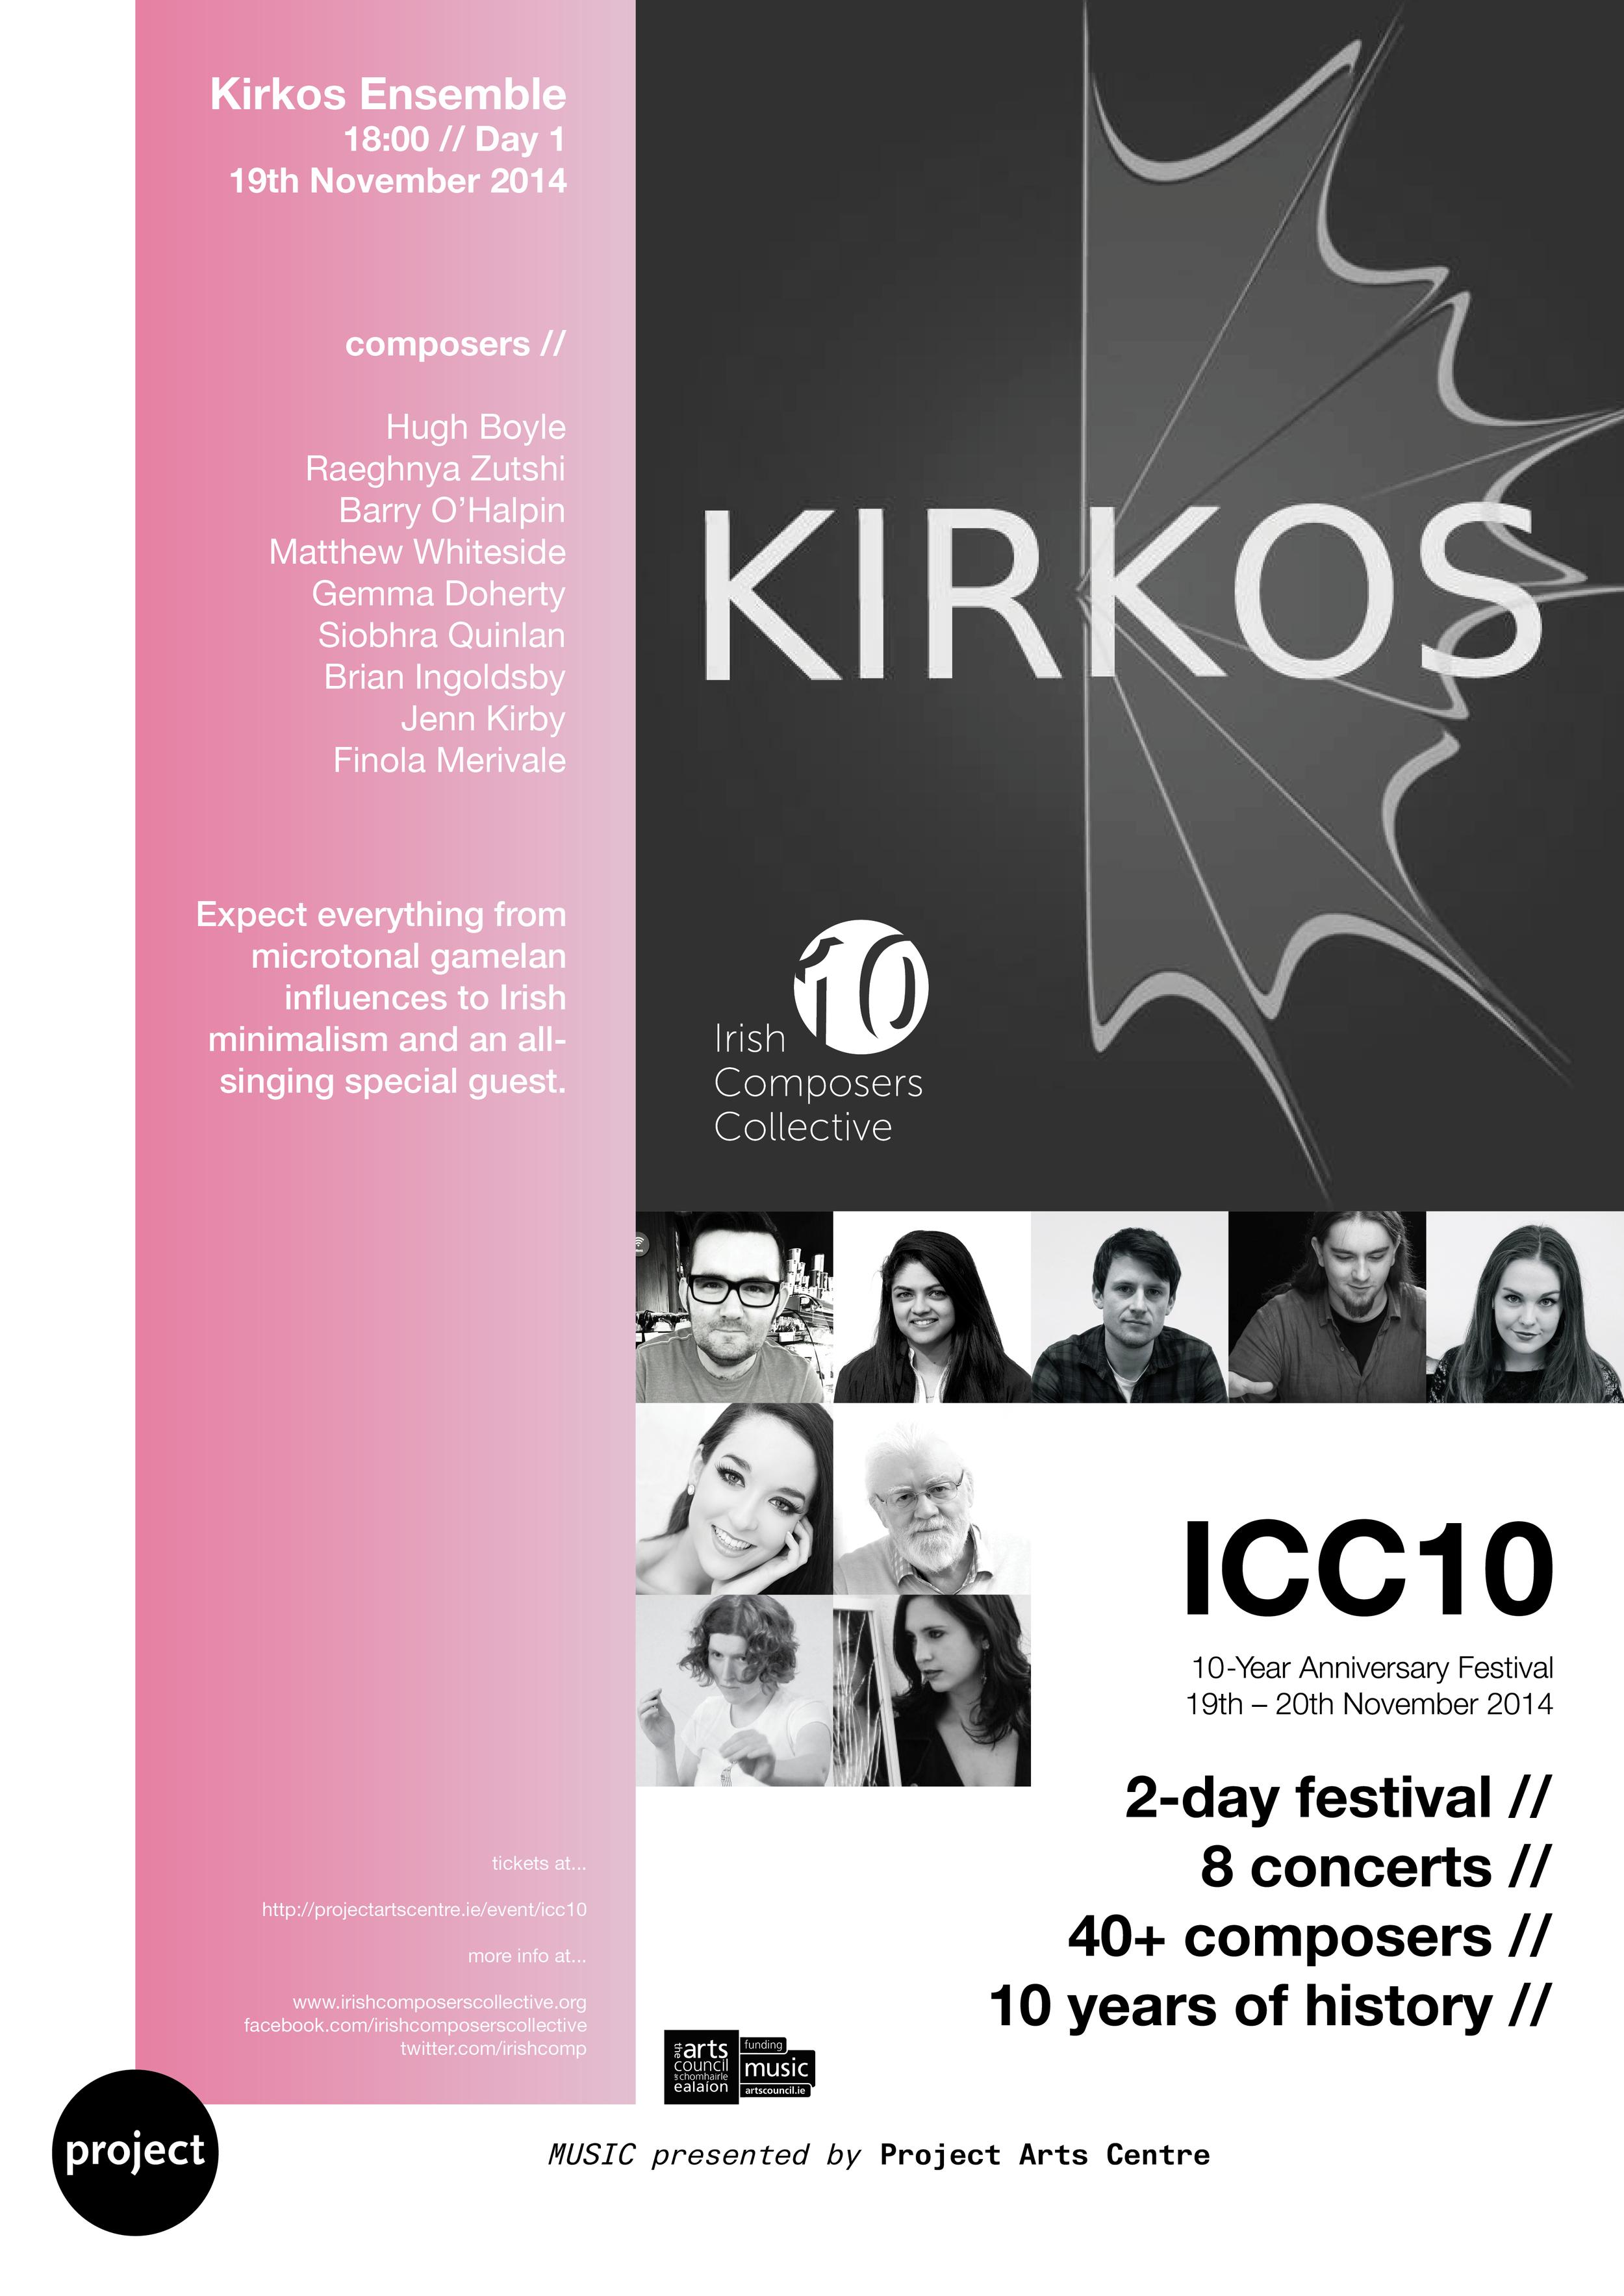 icc10 a3 poster_Kirkos.png